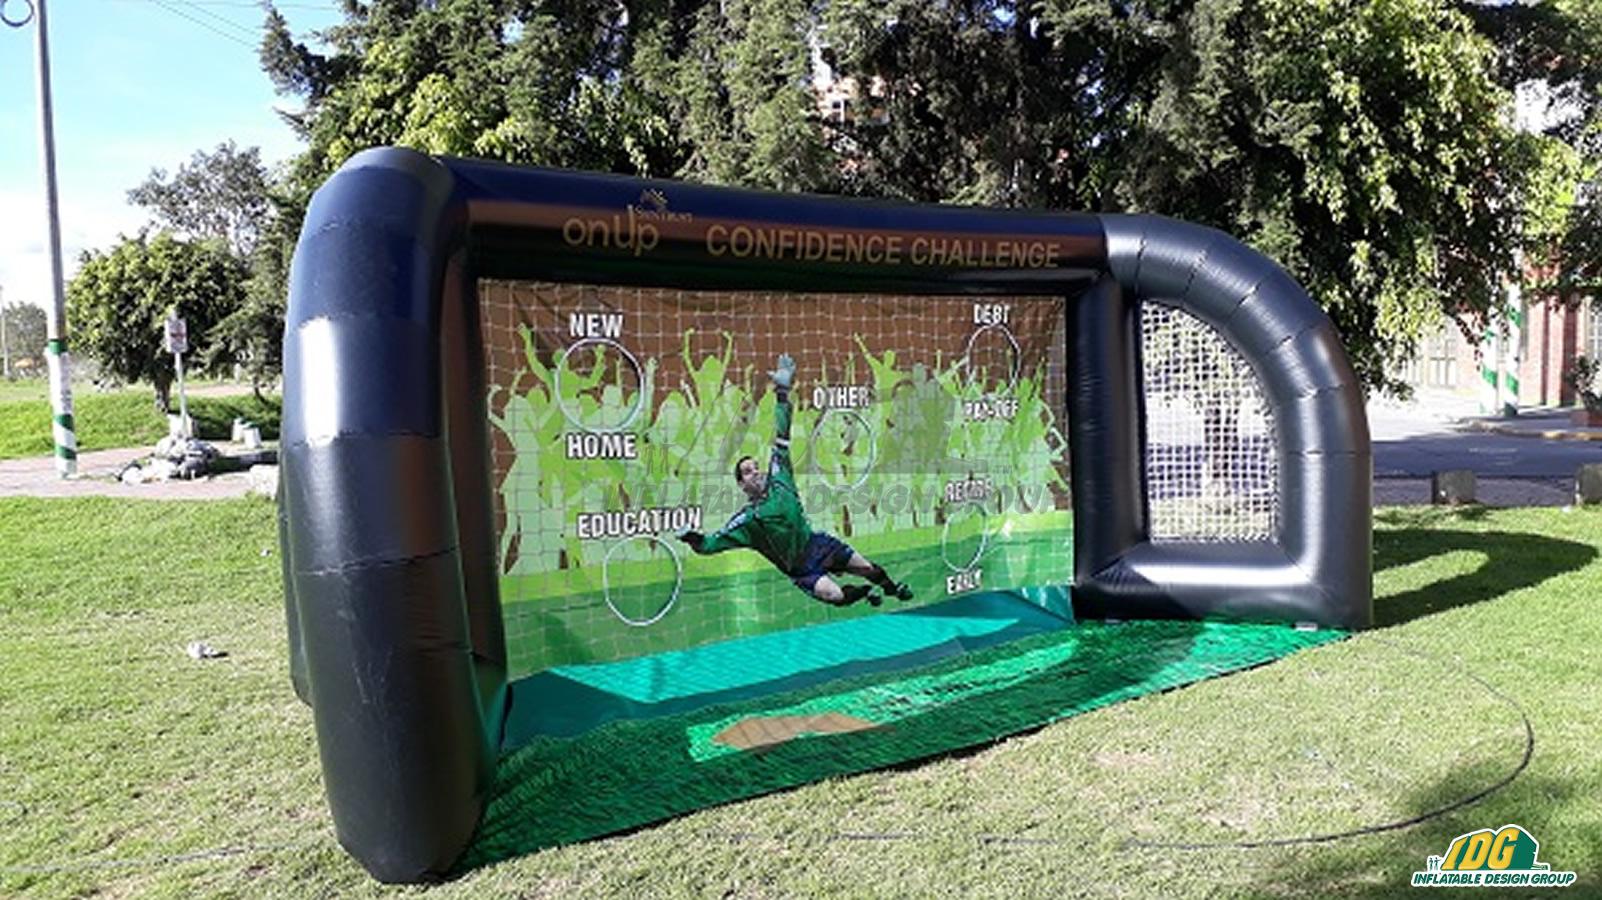 OnUp Inflatable Soccer Challenge